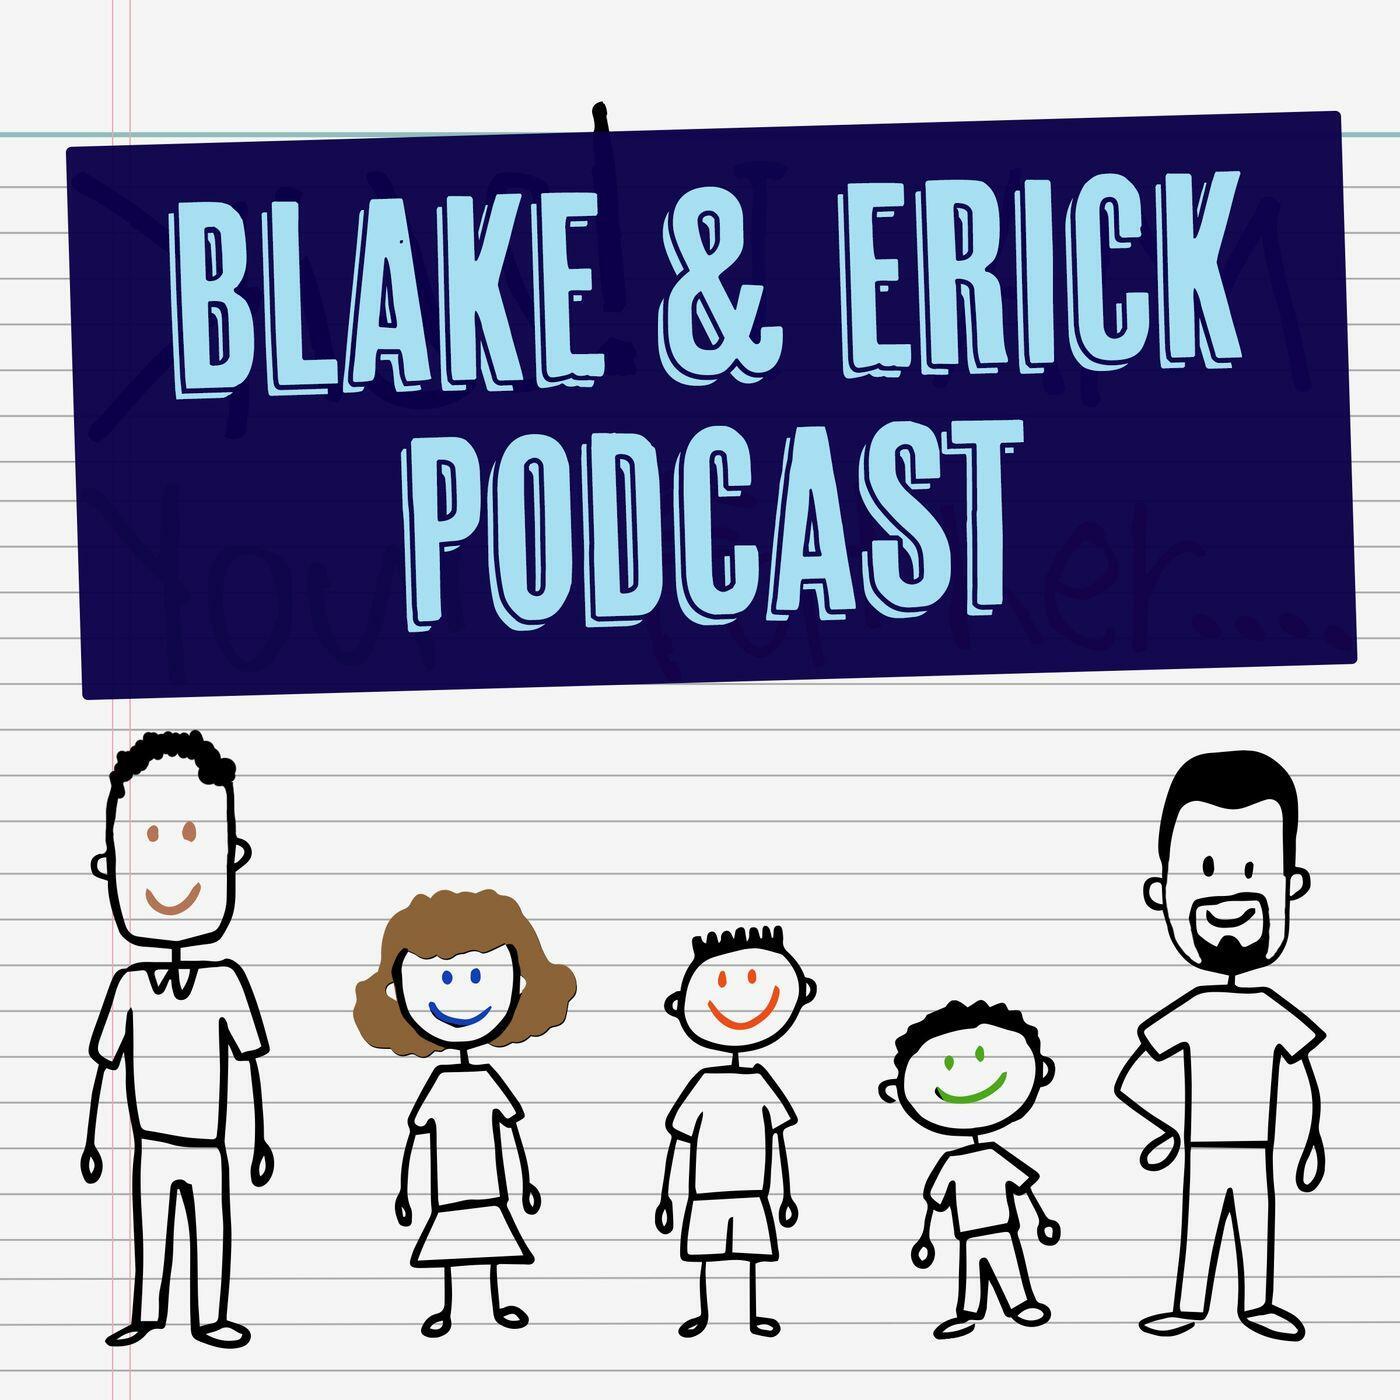 Blake & Erick Podcast